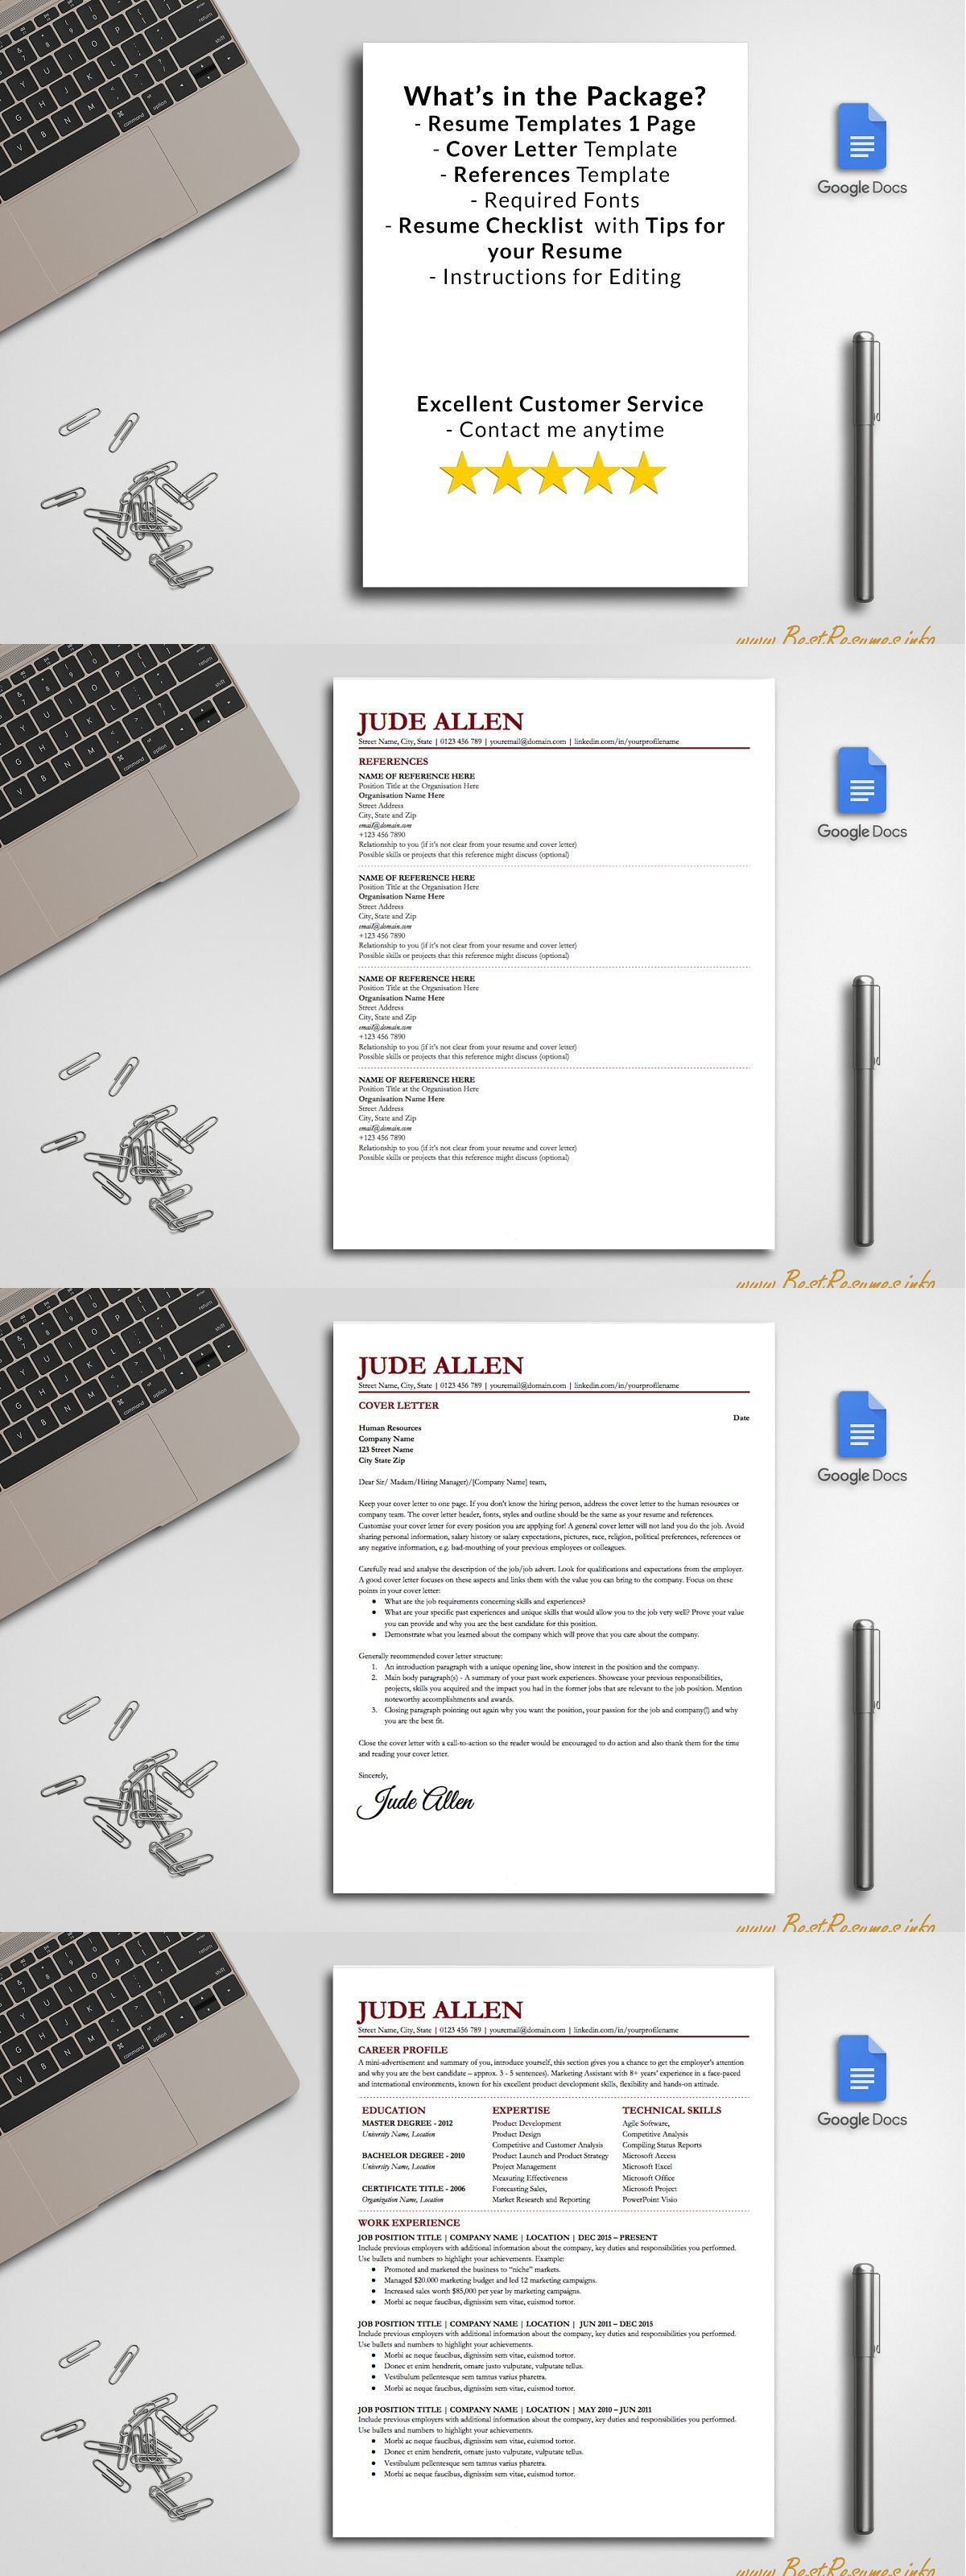 CV Template Zurich Creative cv template, Creative resume